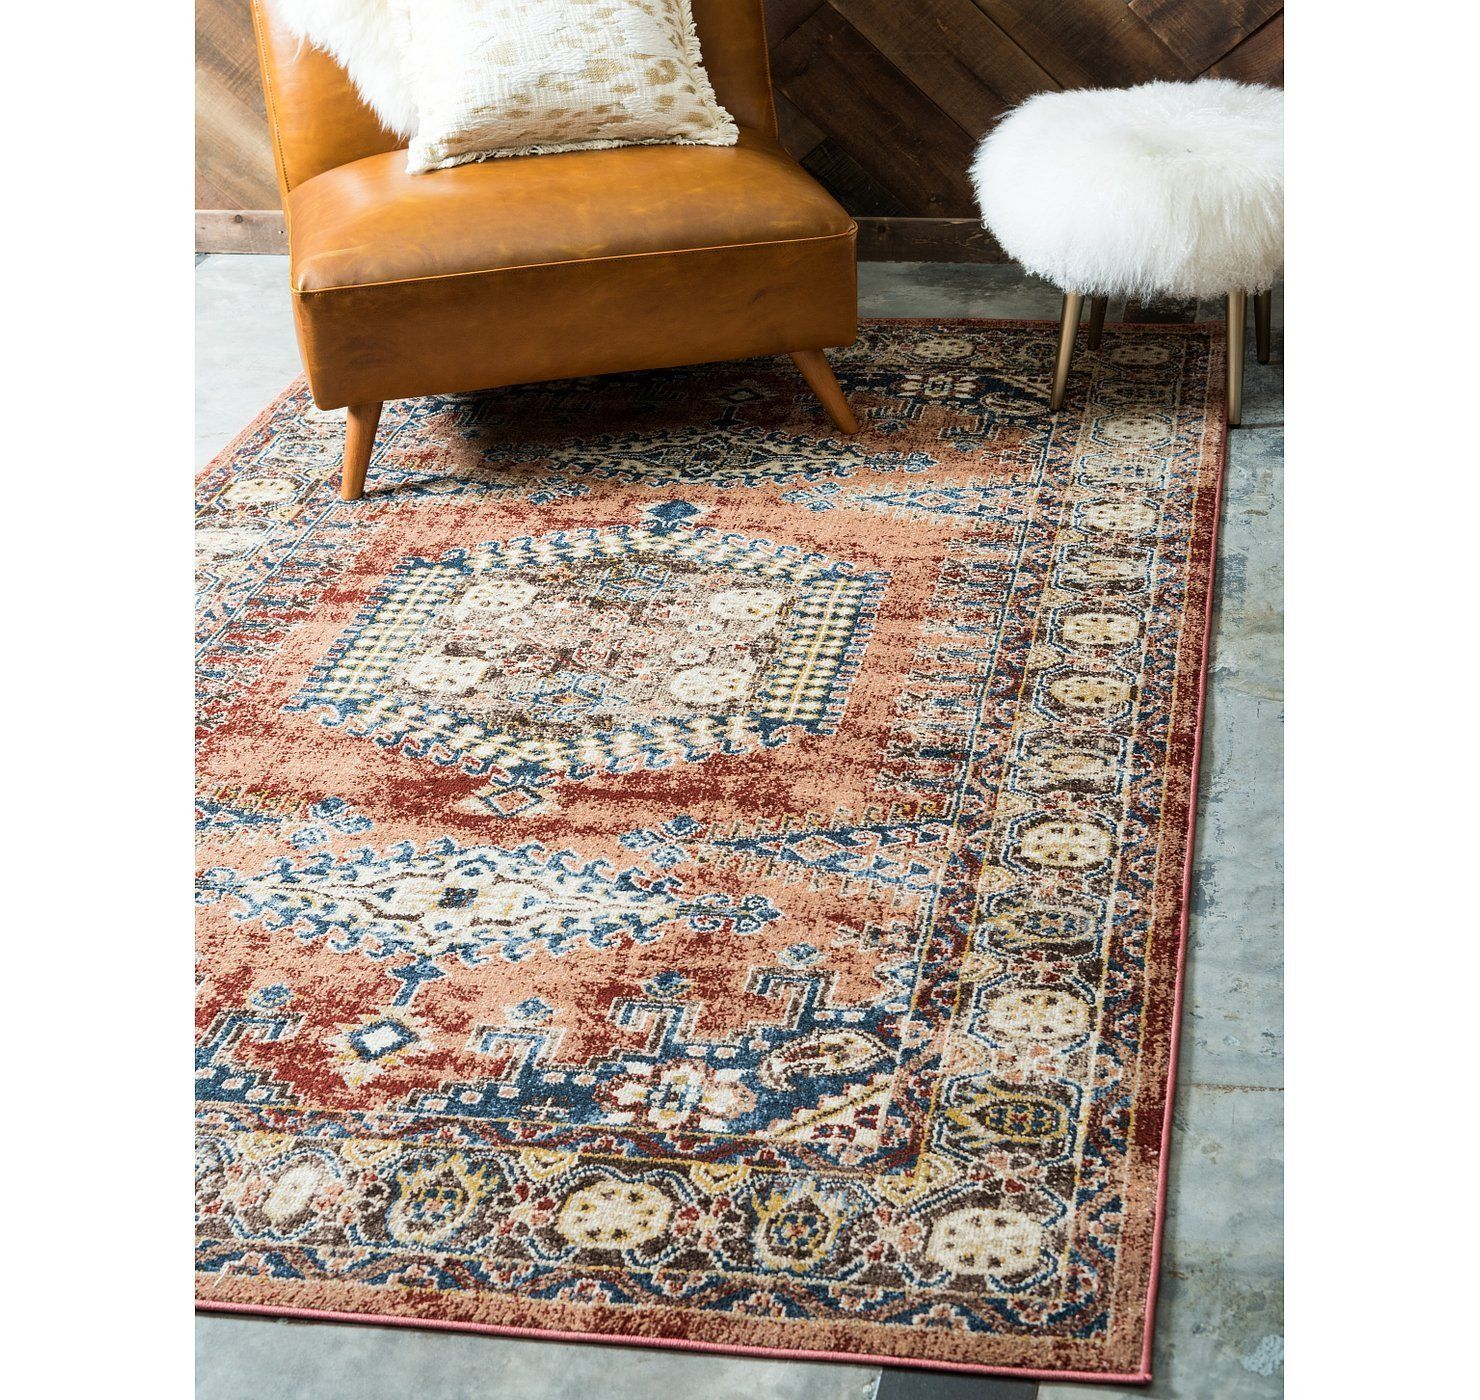 8x10 arcadia rugs esalerugs area rugs farmhouse style